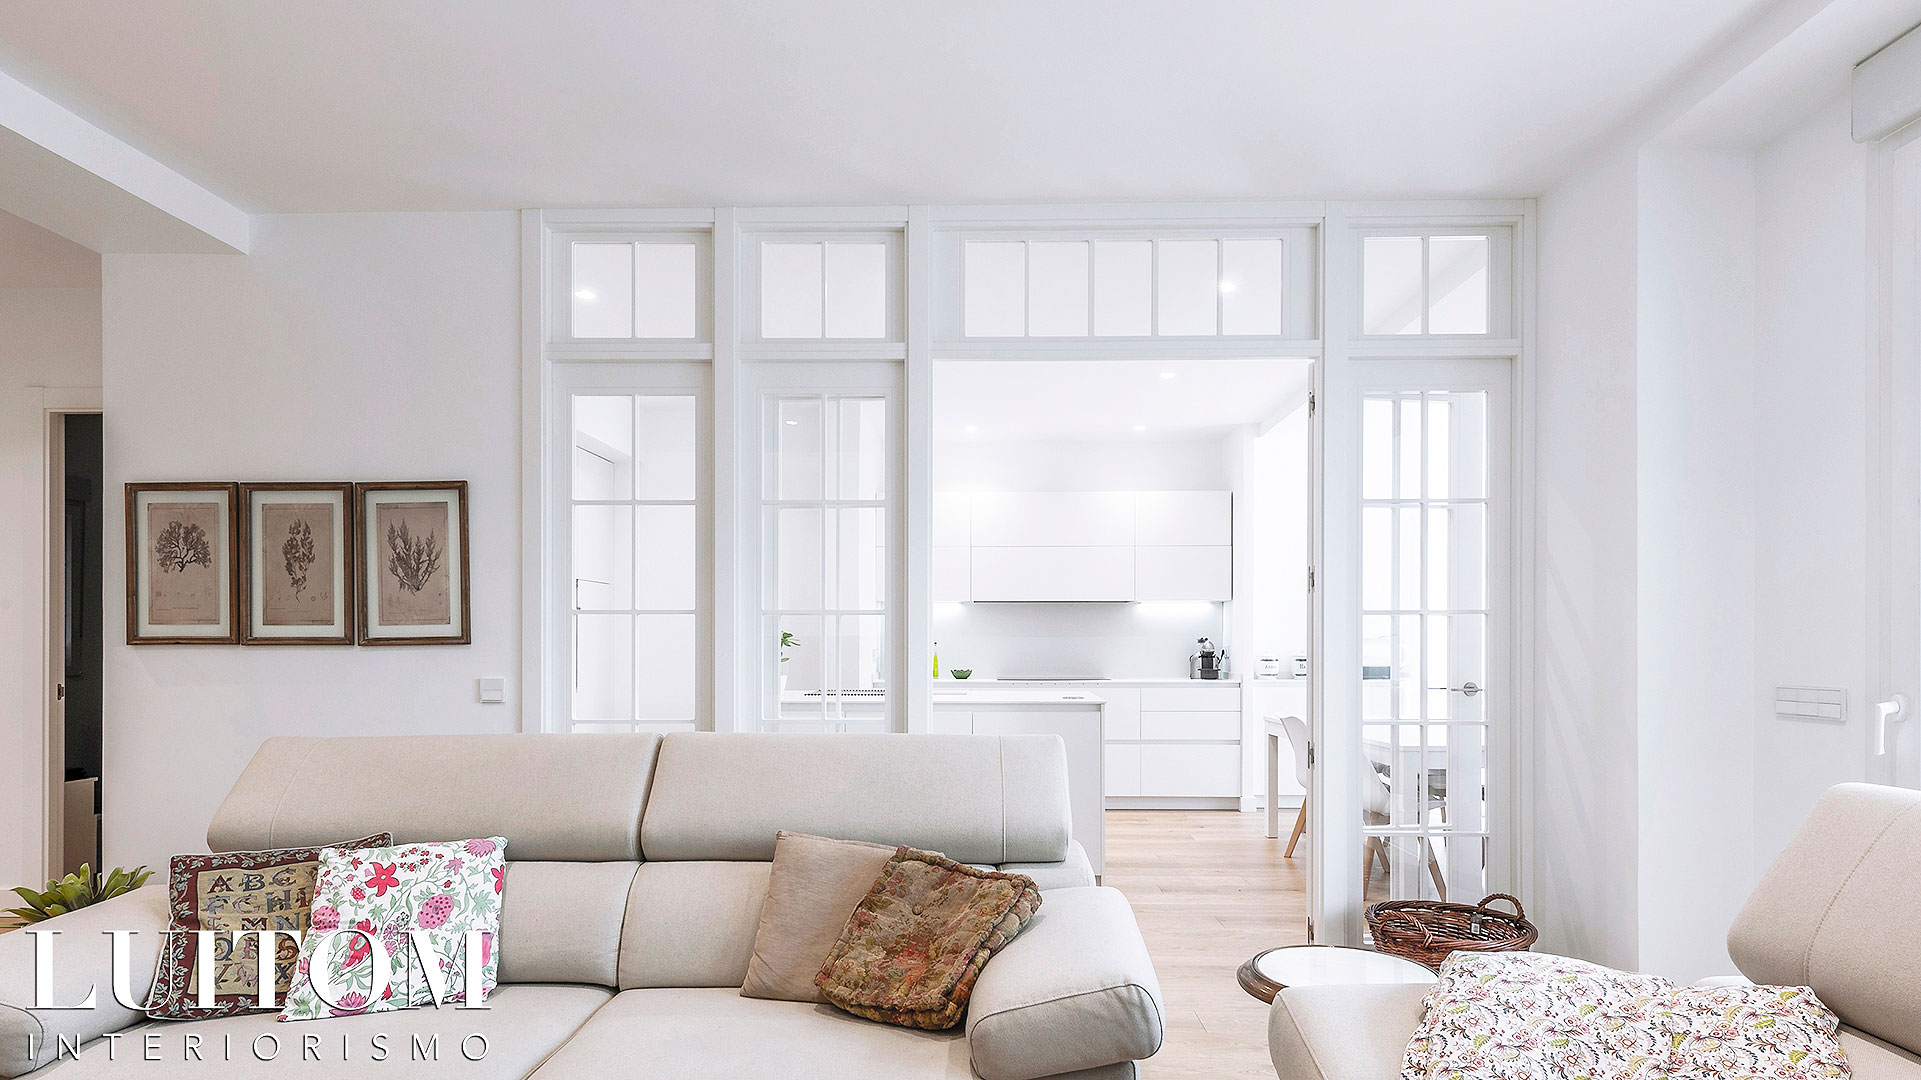 ideas-reformas-casas-lujo-interiorismo-decoracion-viviendas-luxury-home-living-kitchen-interior-design-11